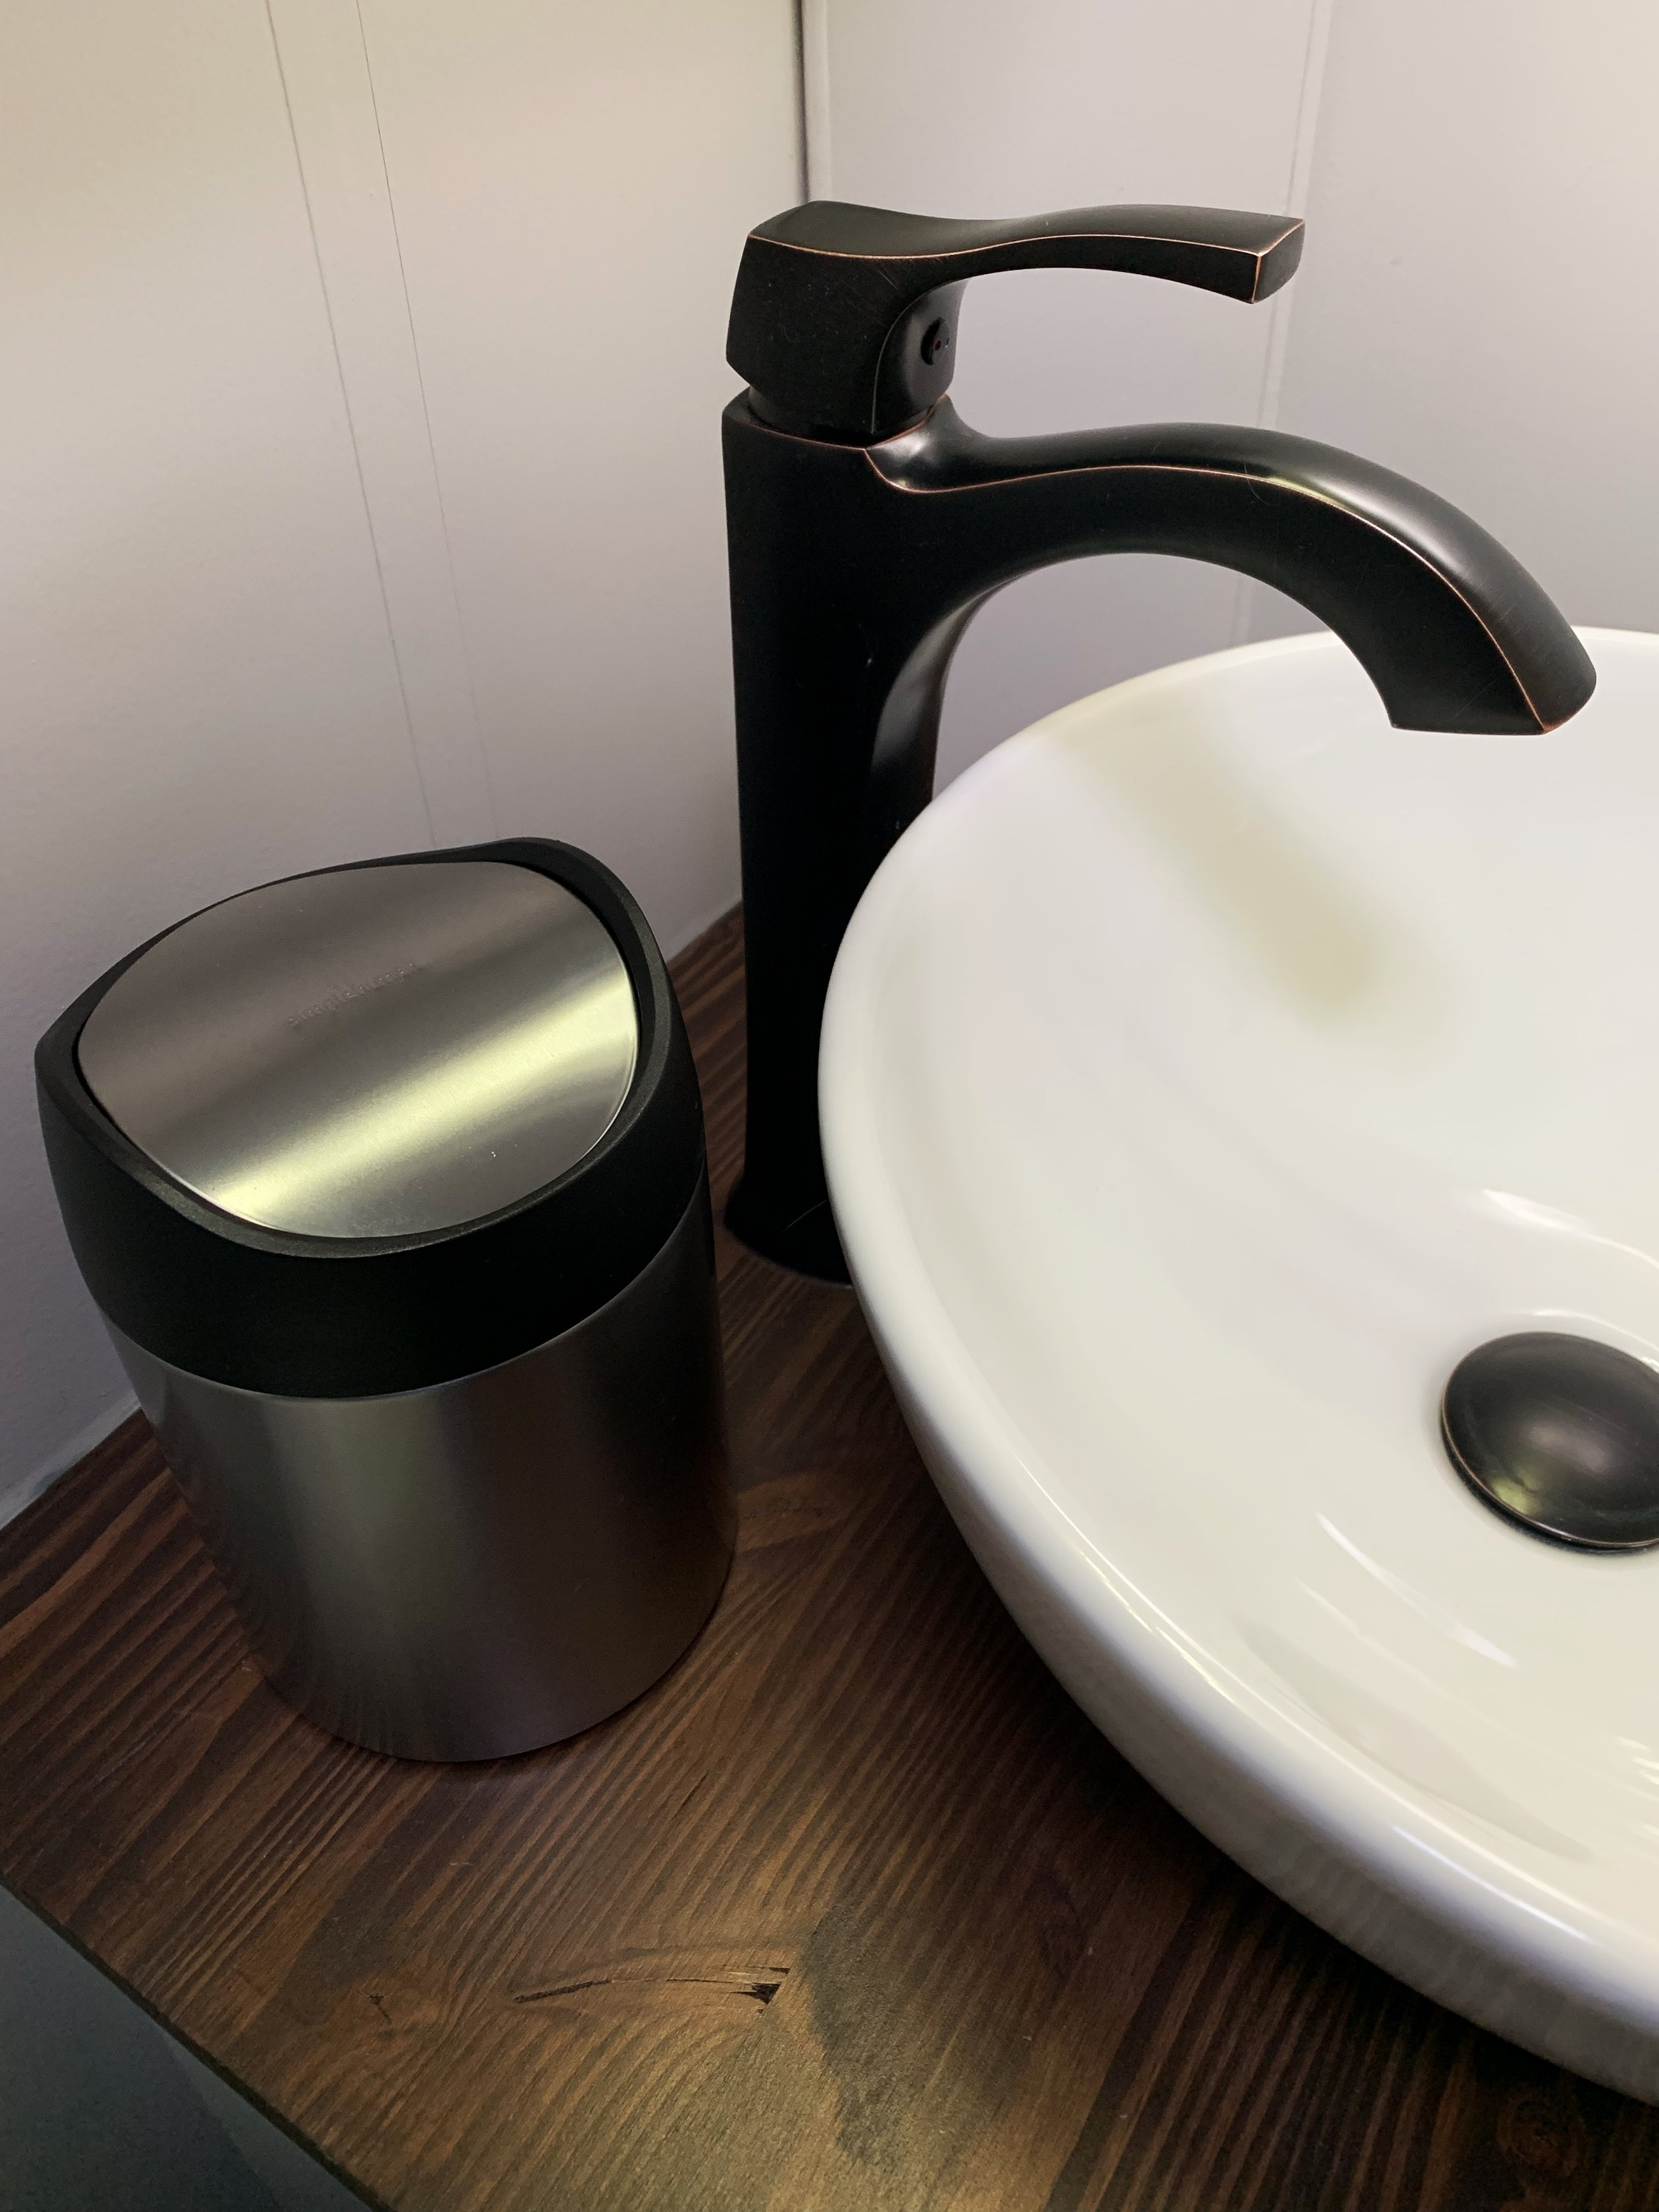 "Our $15 simplehuman trash can - 7.4"" x 5"" diameter"